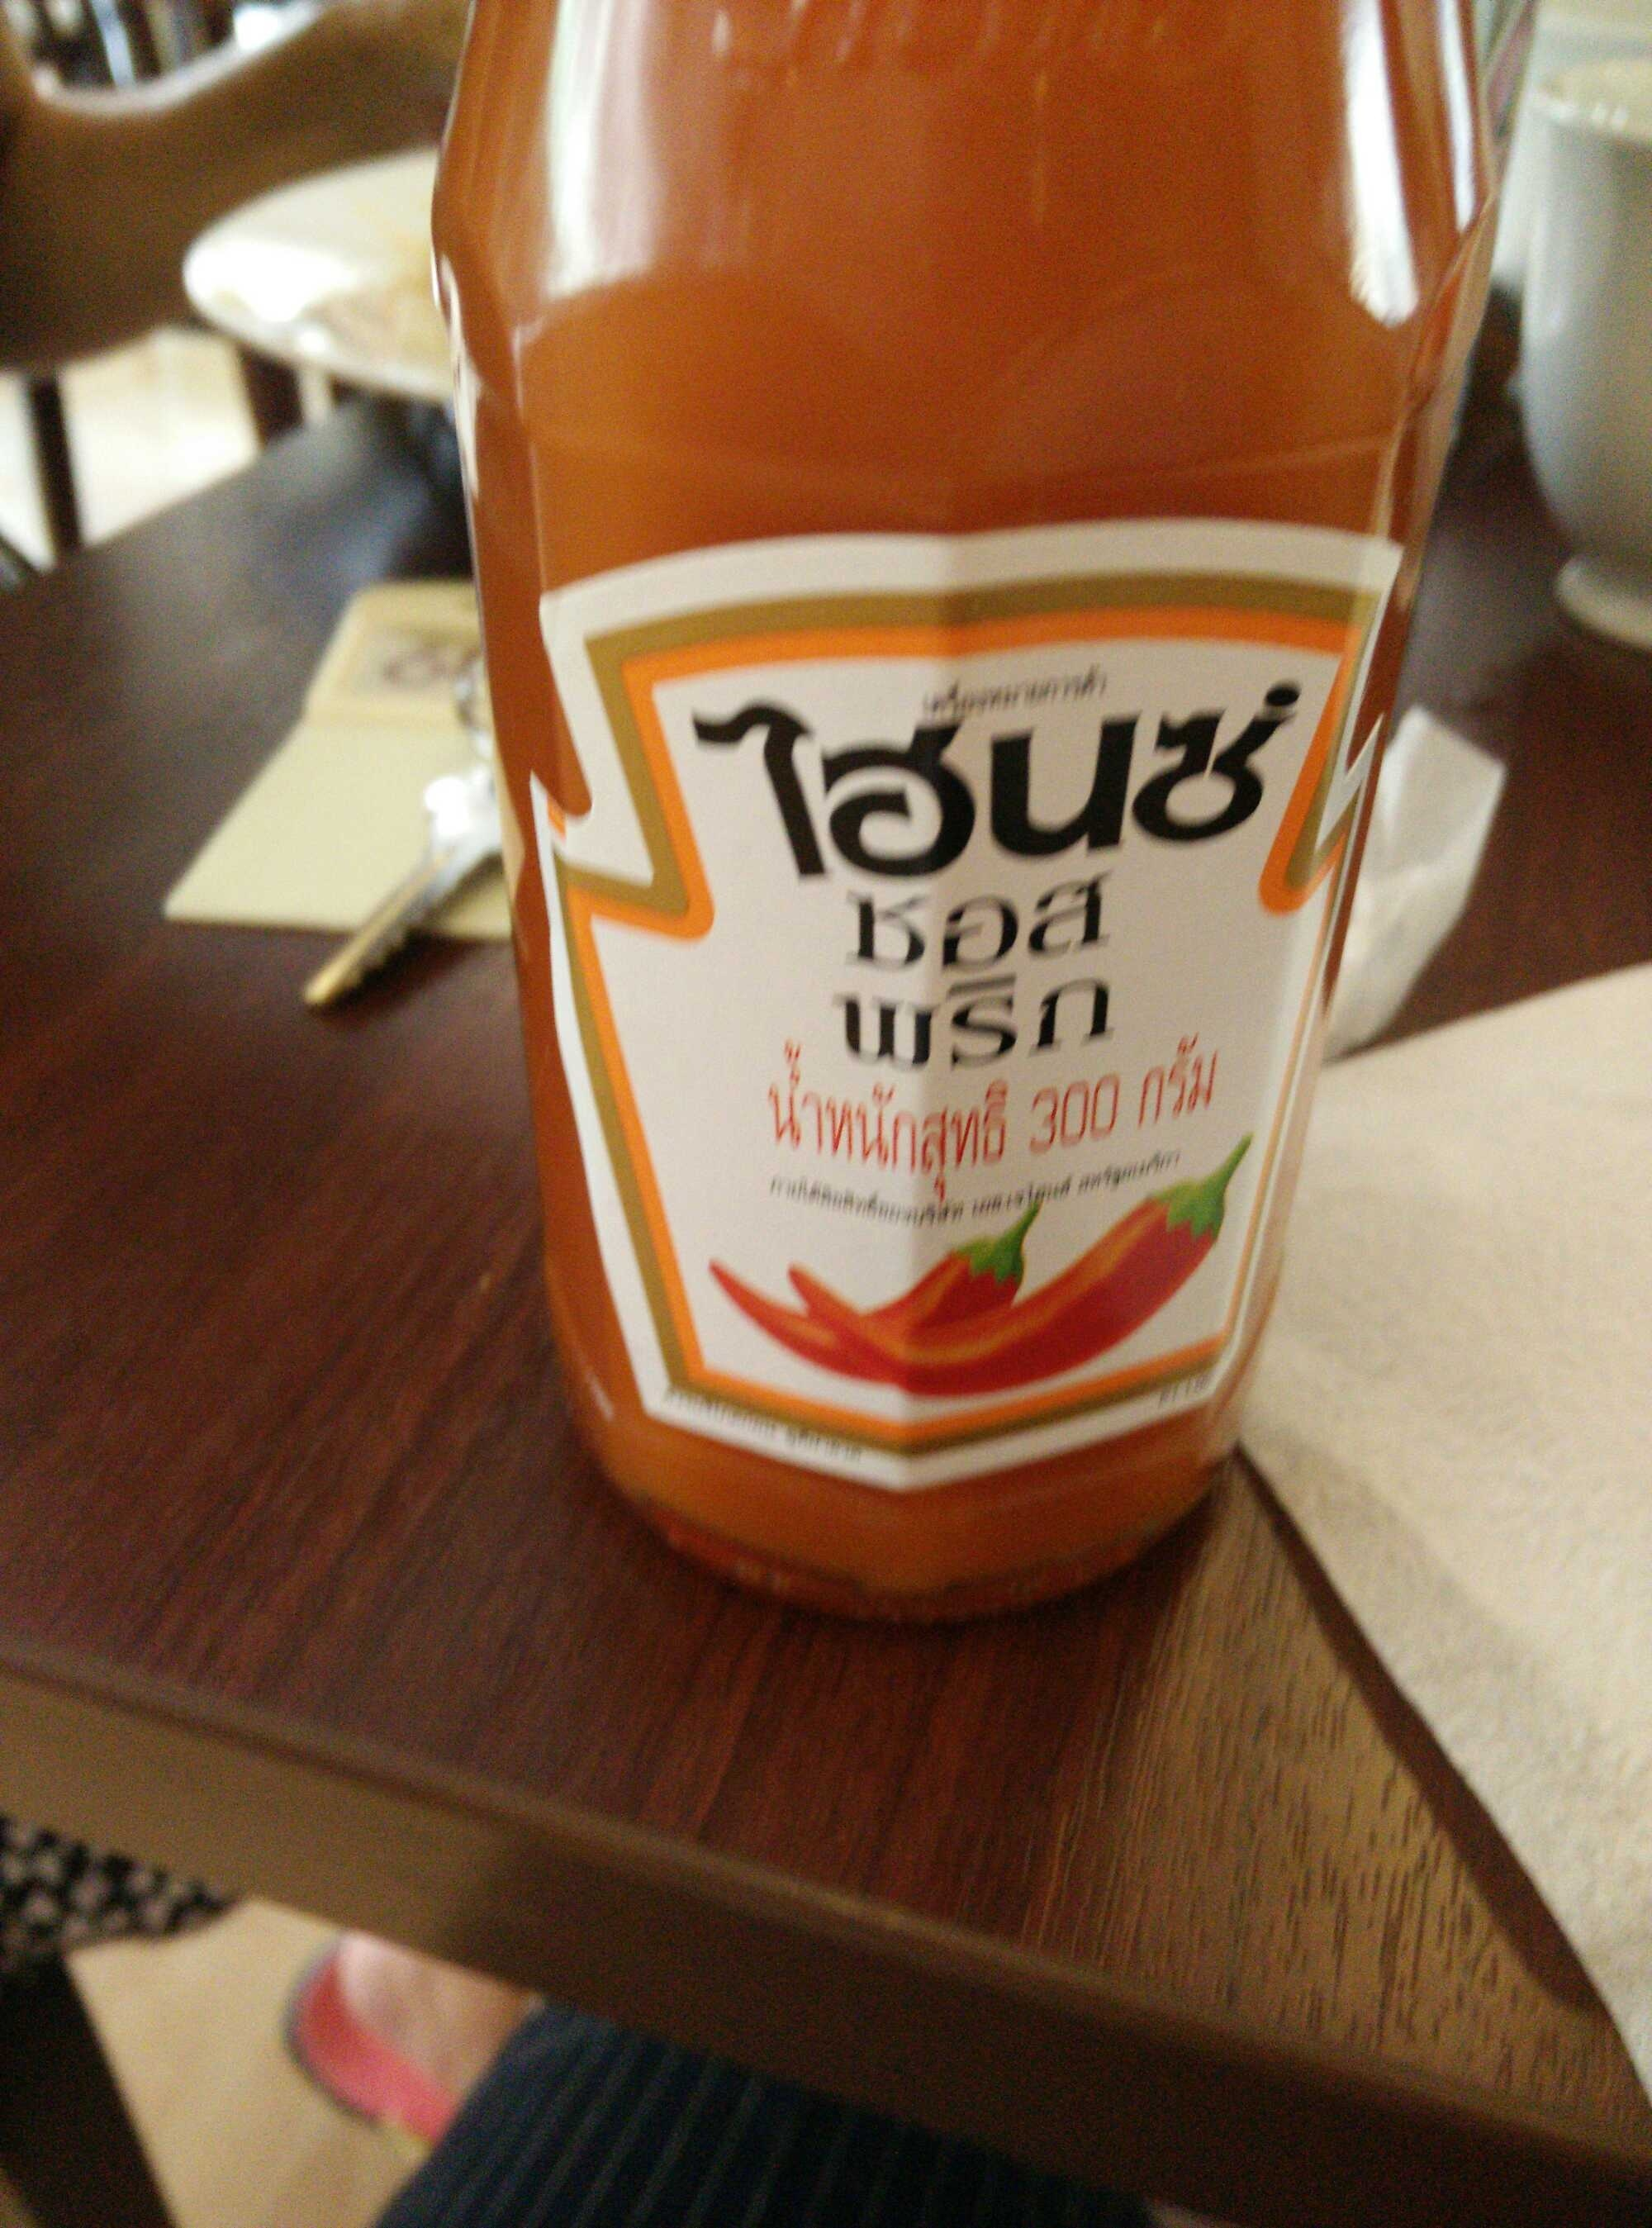 chili sauce - Product